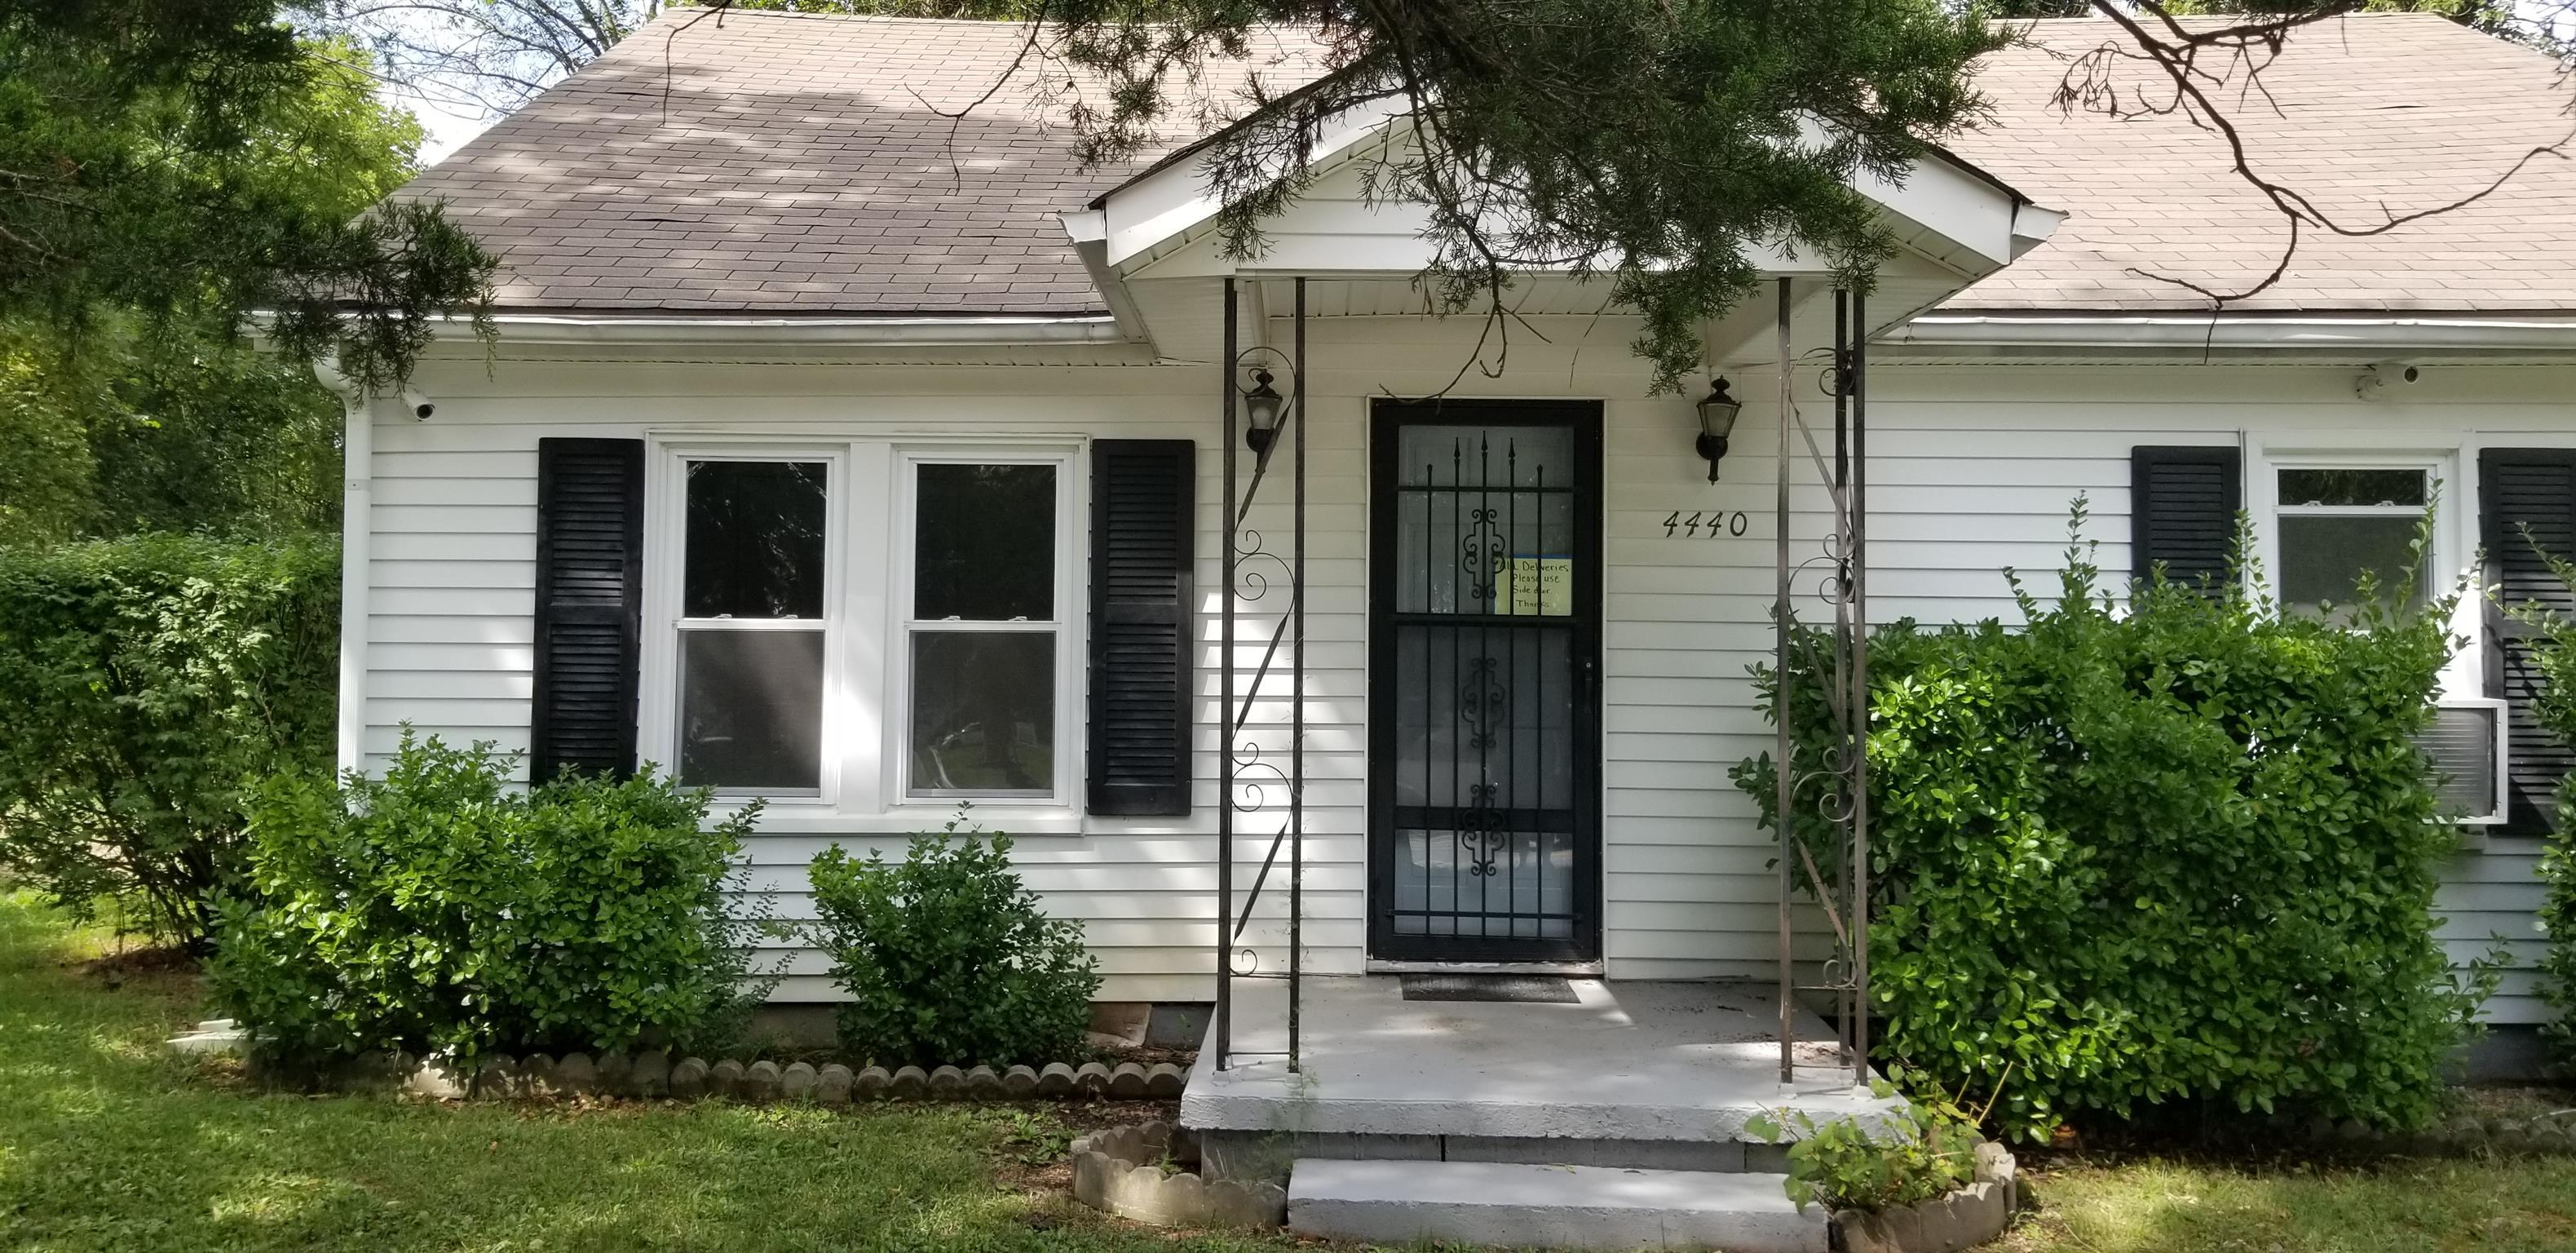 4440 Sulphur Springs Rd, Murfreesboro, TN 37129 - Murfreesboro, TN real estate listing